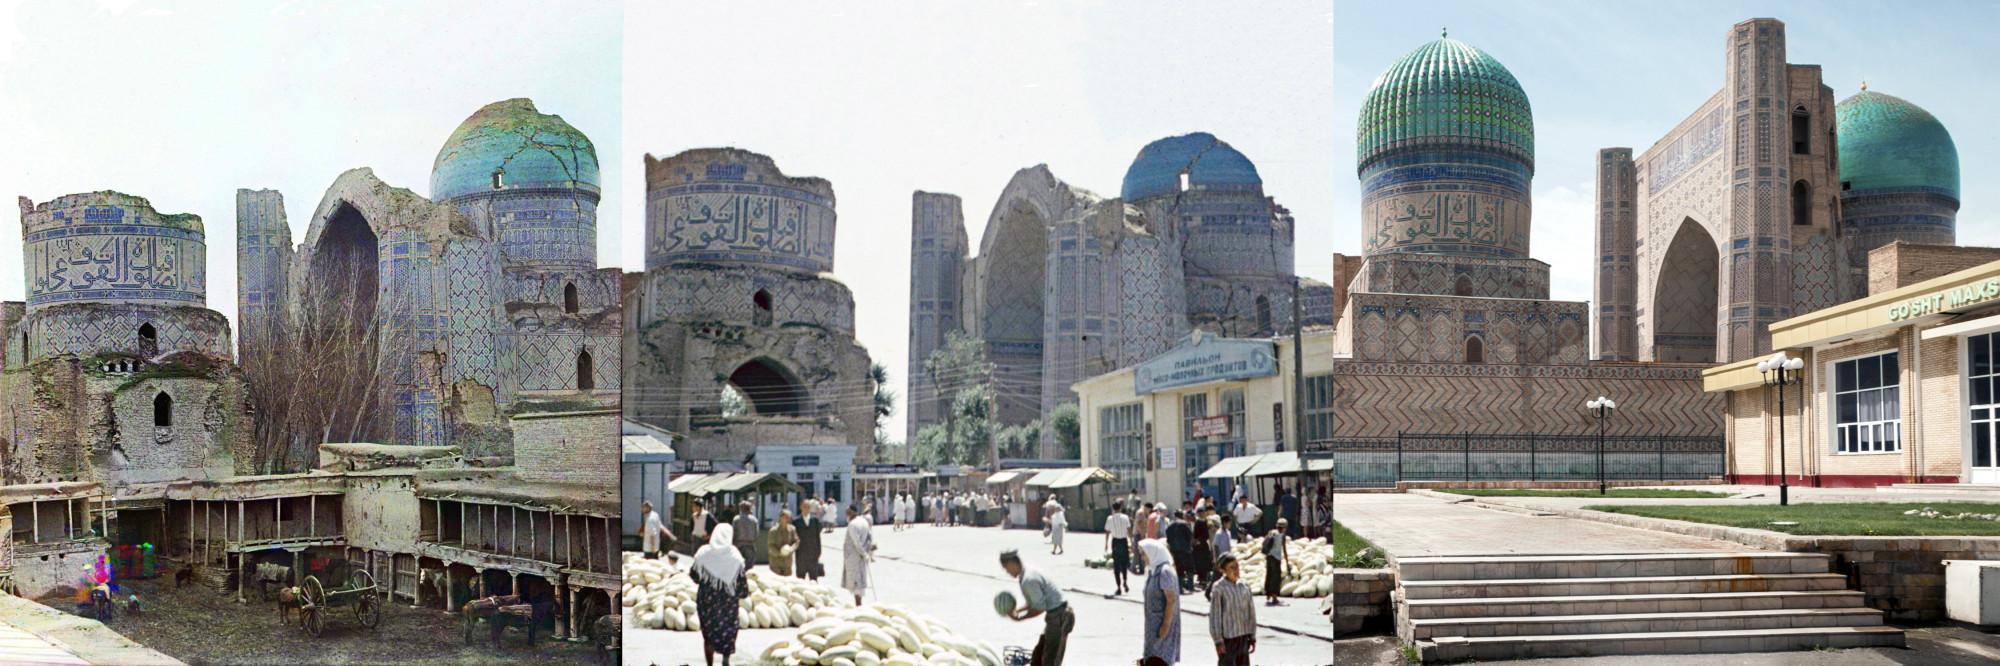 3 эпохи. Самарканд. Мечеть Биби-Ханым 1907-1966-2017